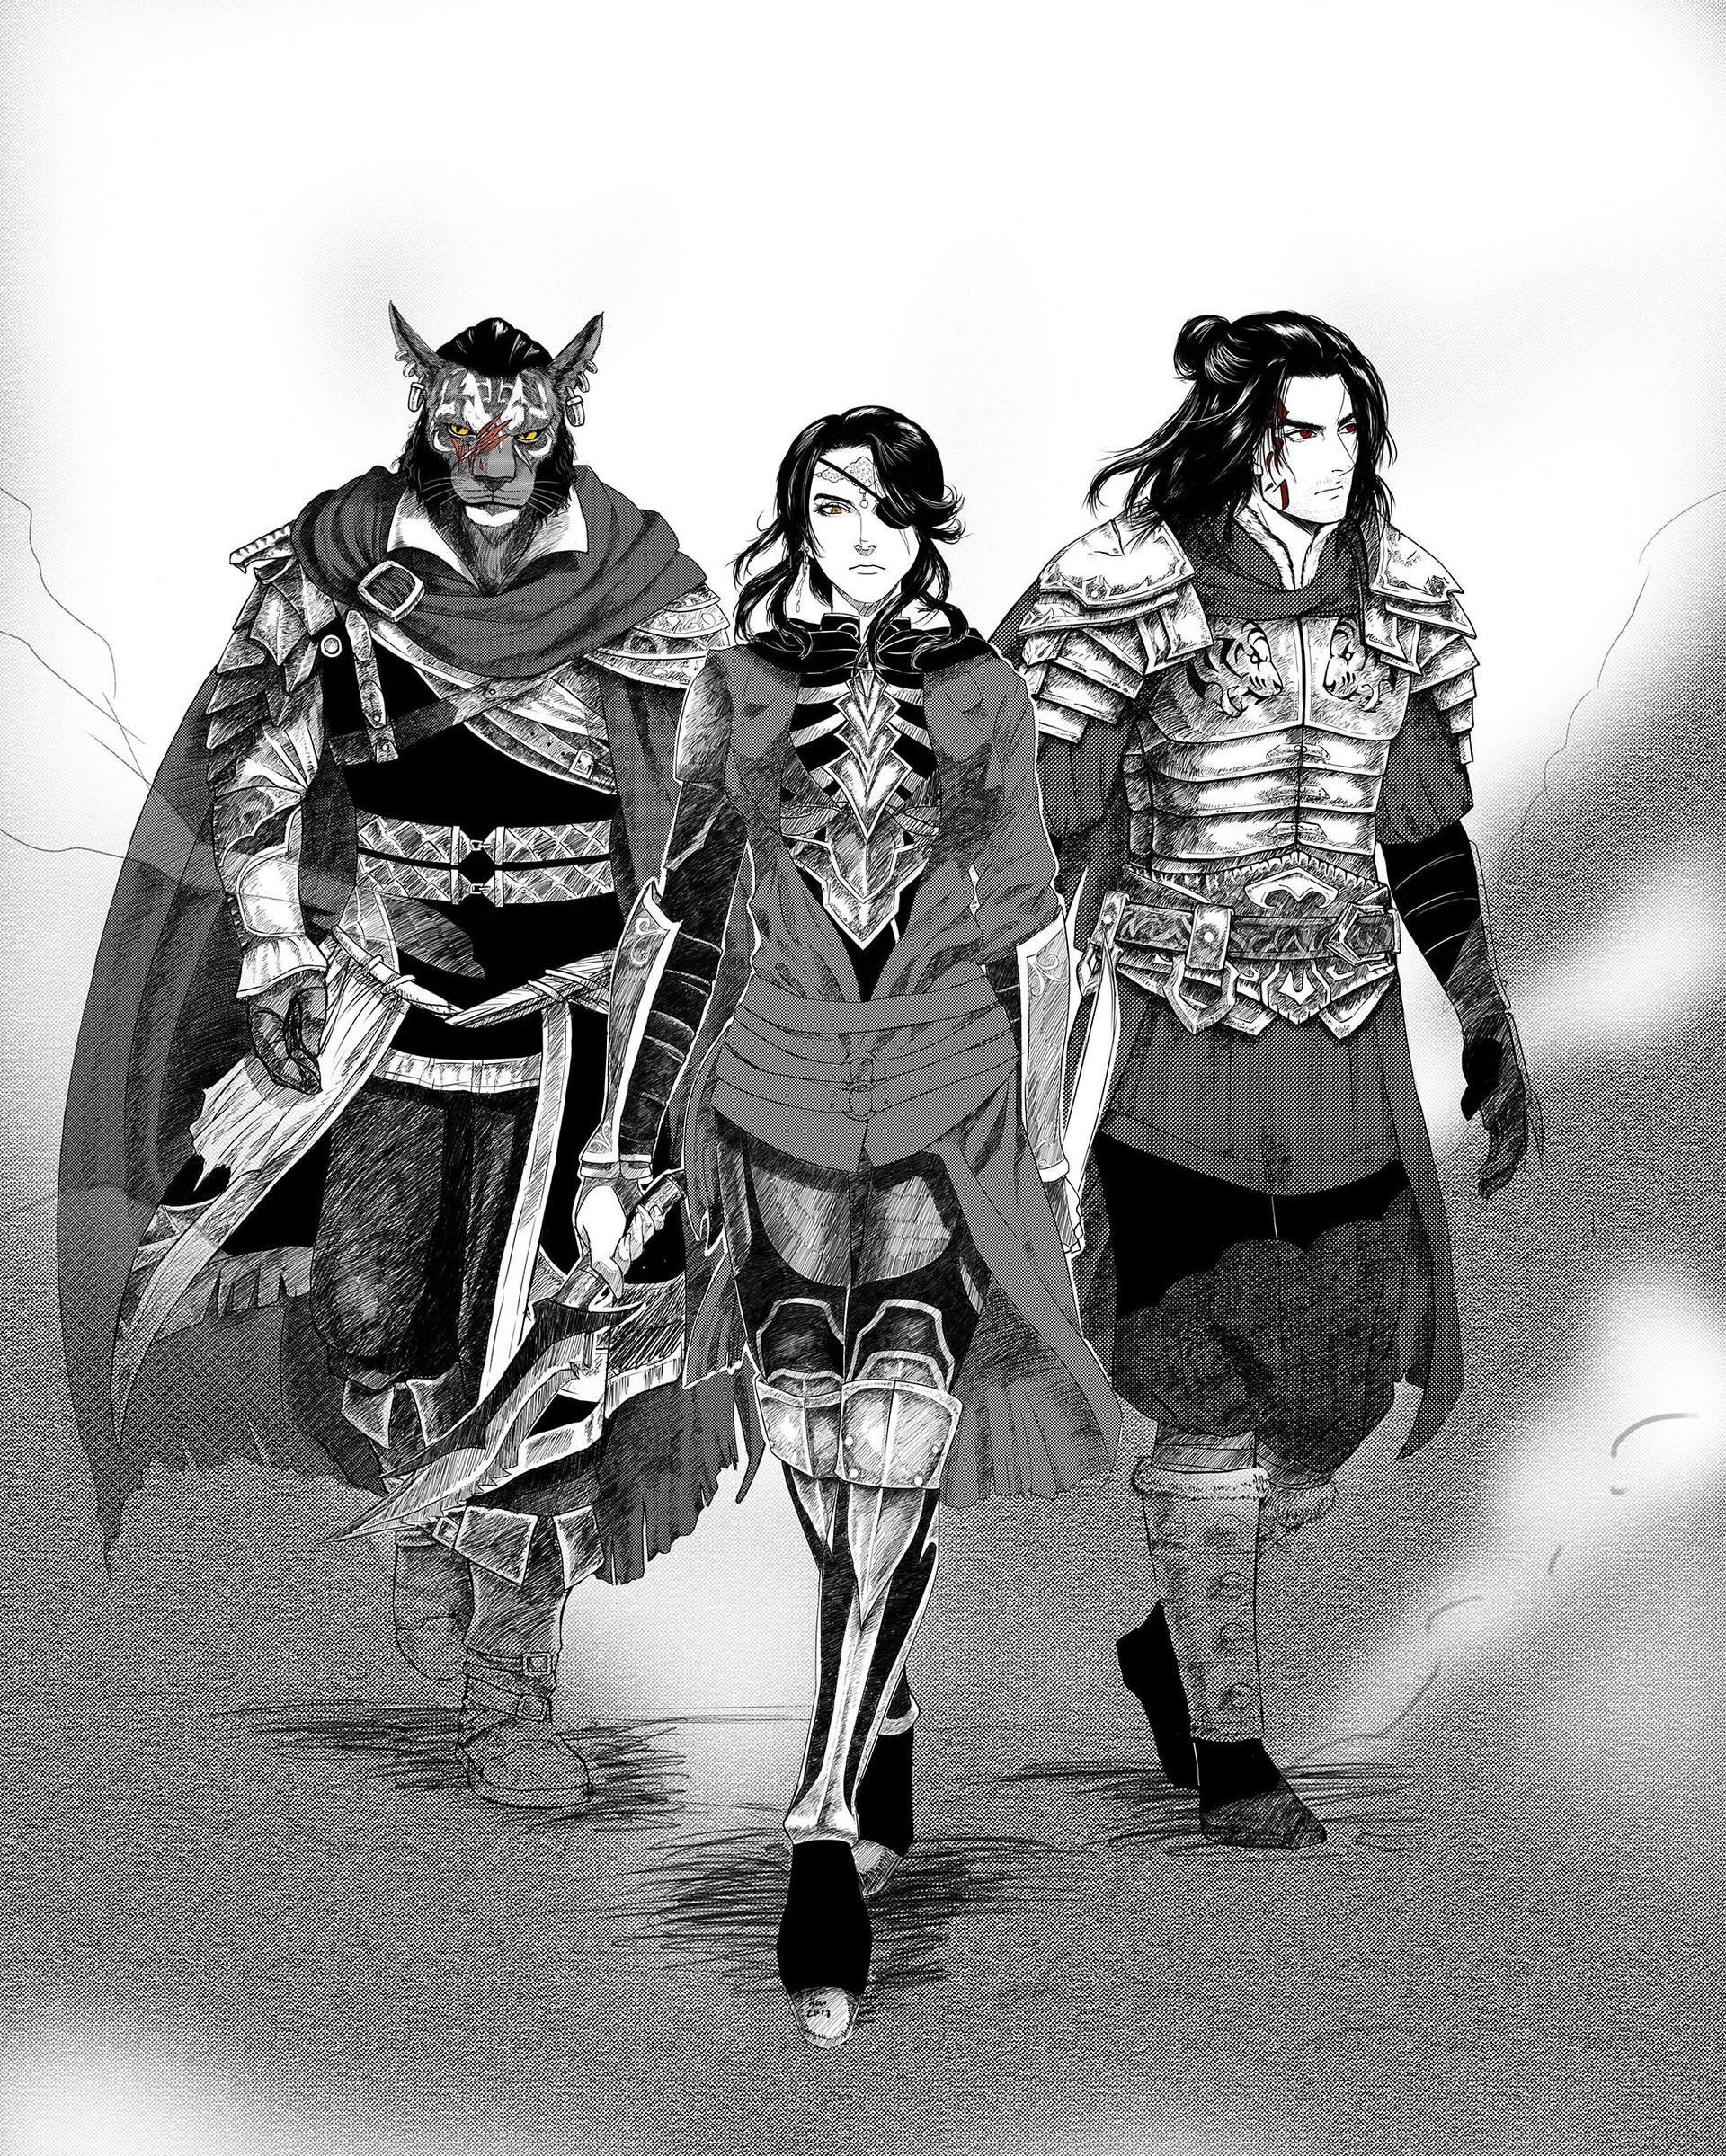 marnie lacsena - skyrim characters